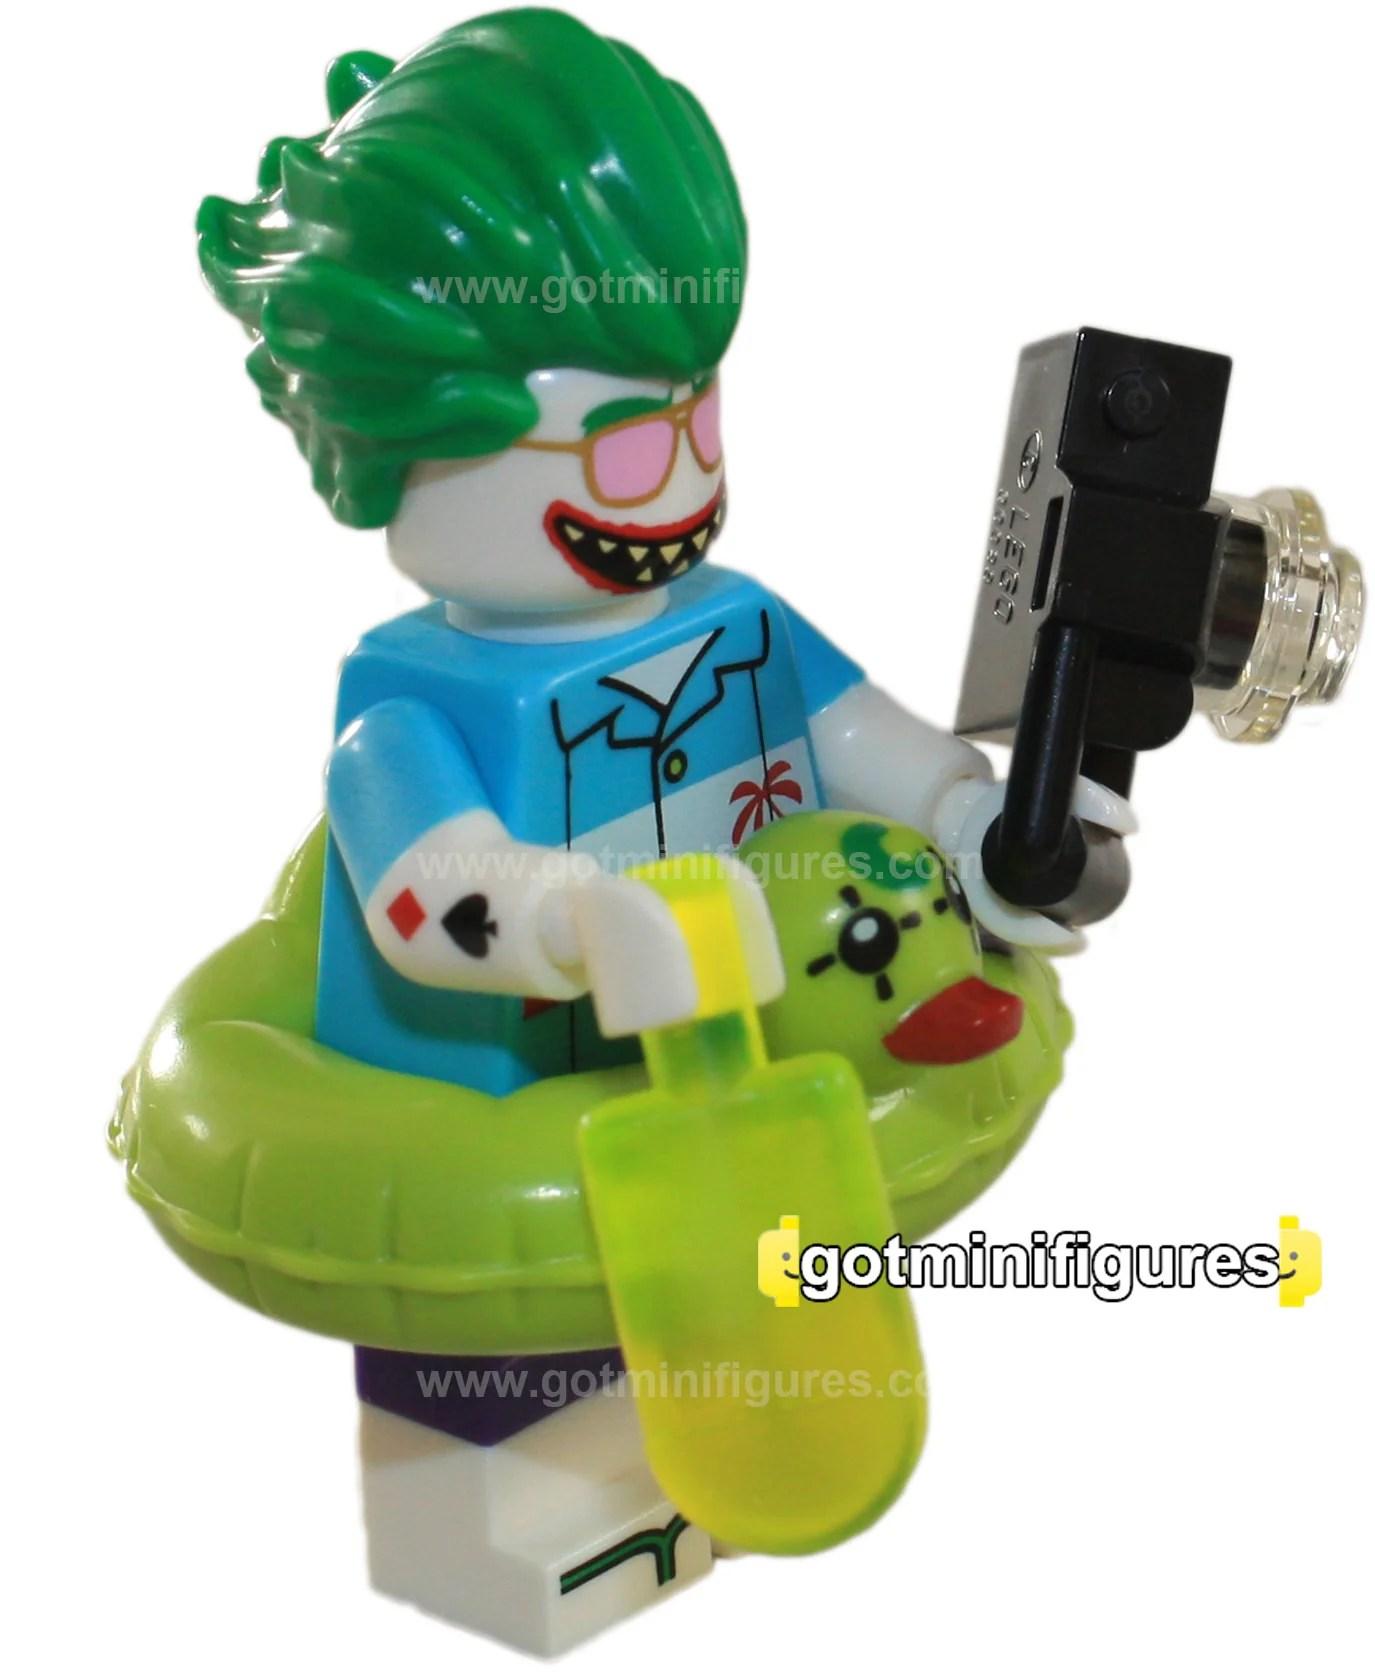 New Lego Batman Movie Series 2 Vacation The Joker Batman 71017 71020 Sealed Building Toys Keymouseit Com